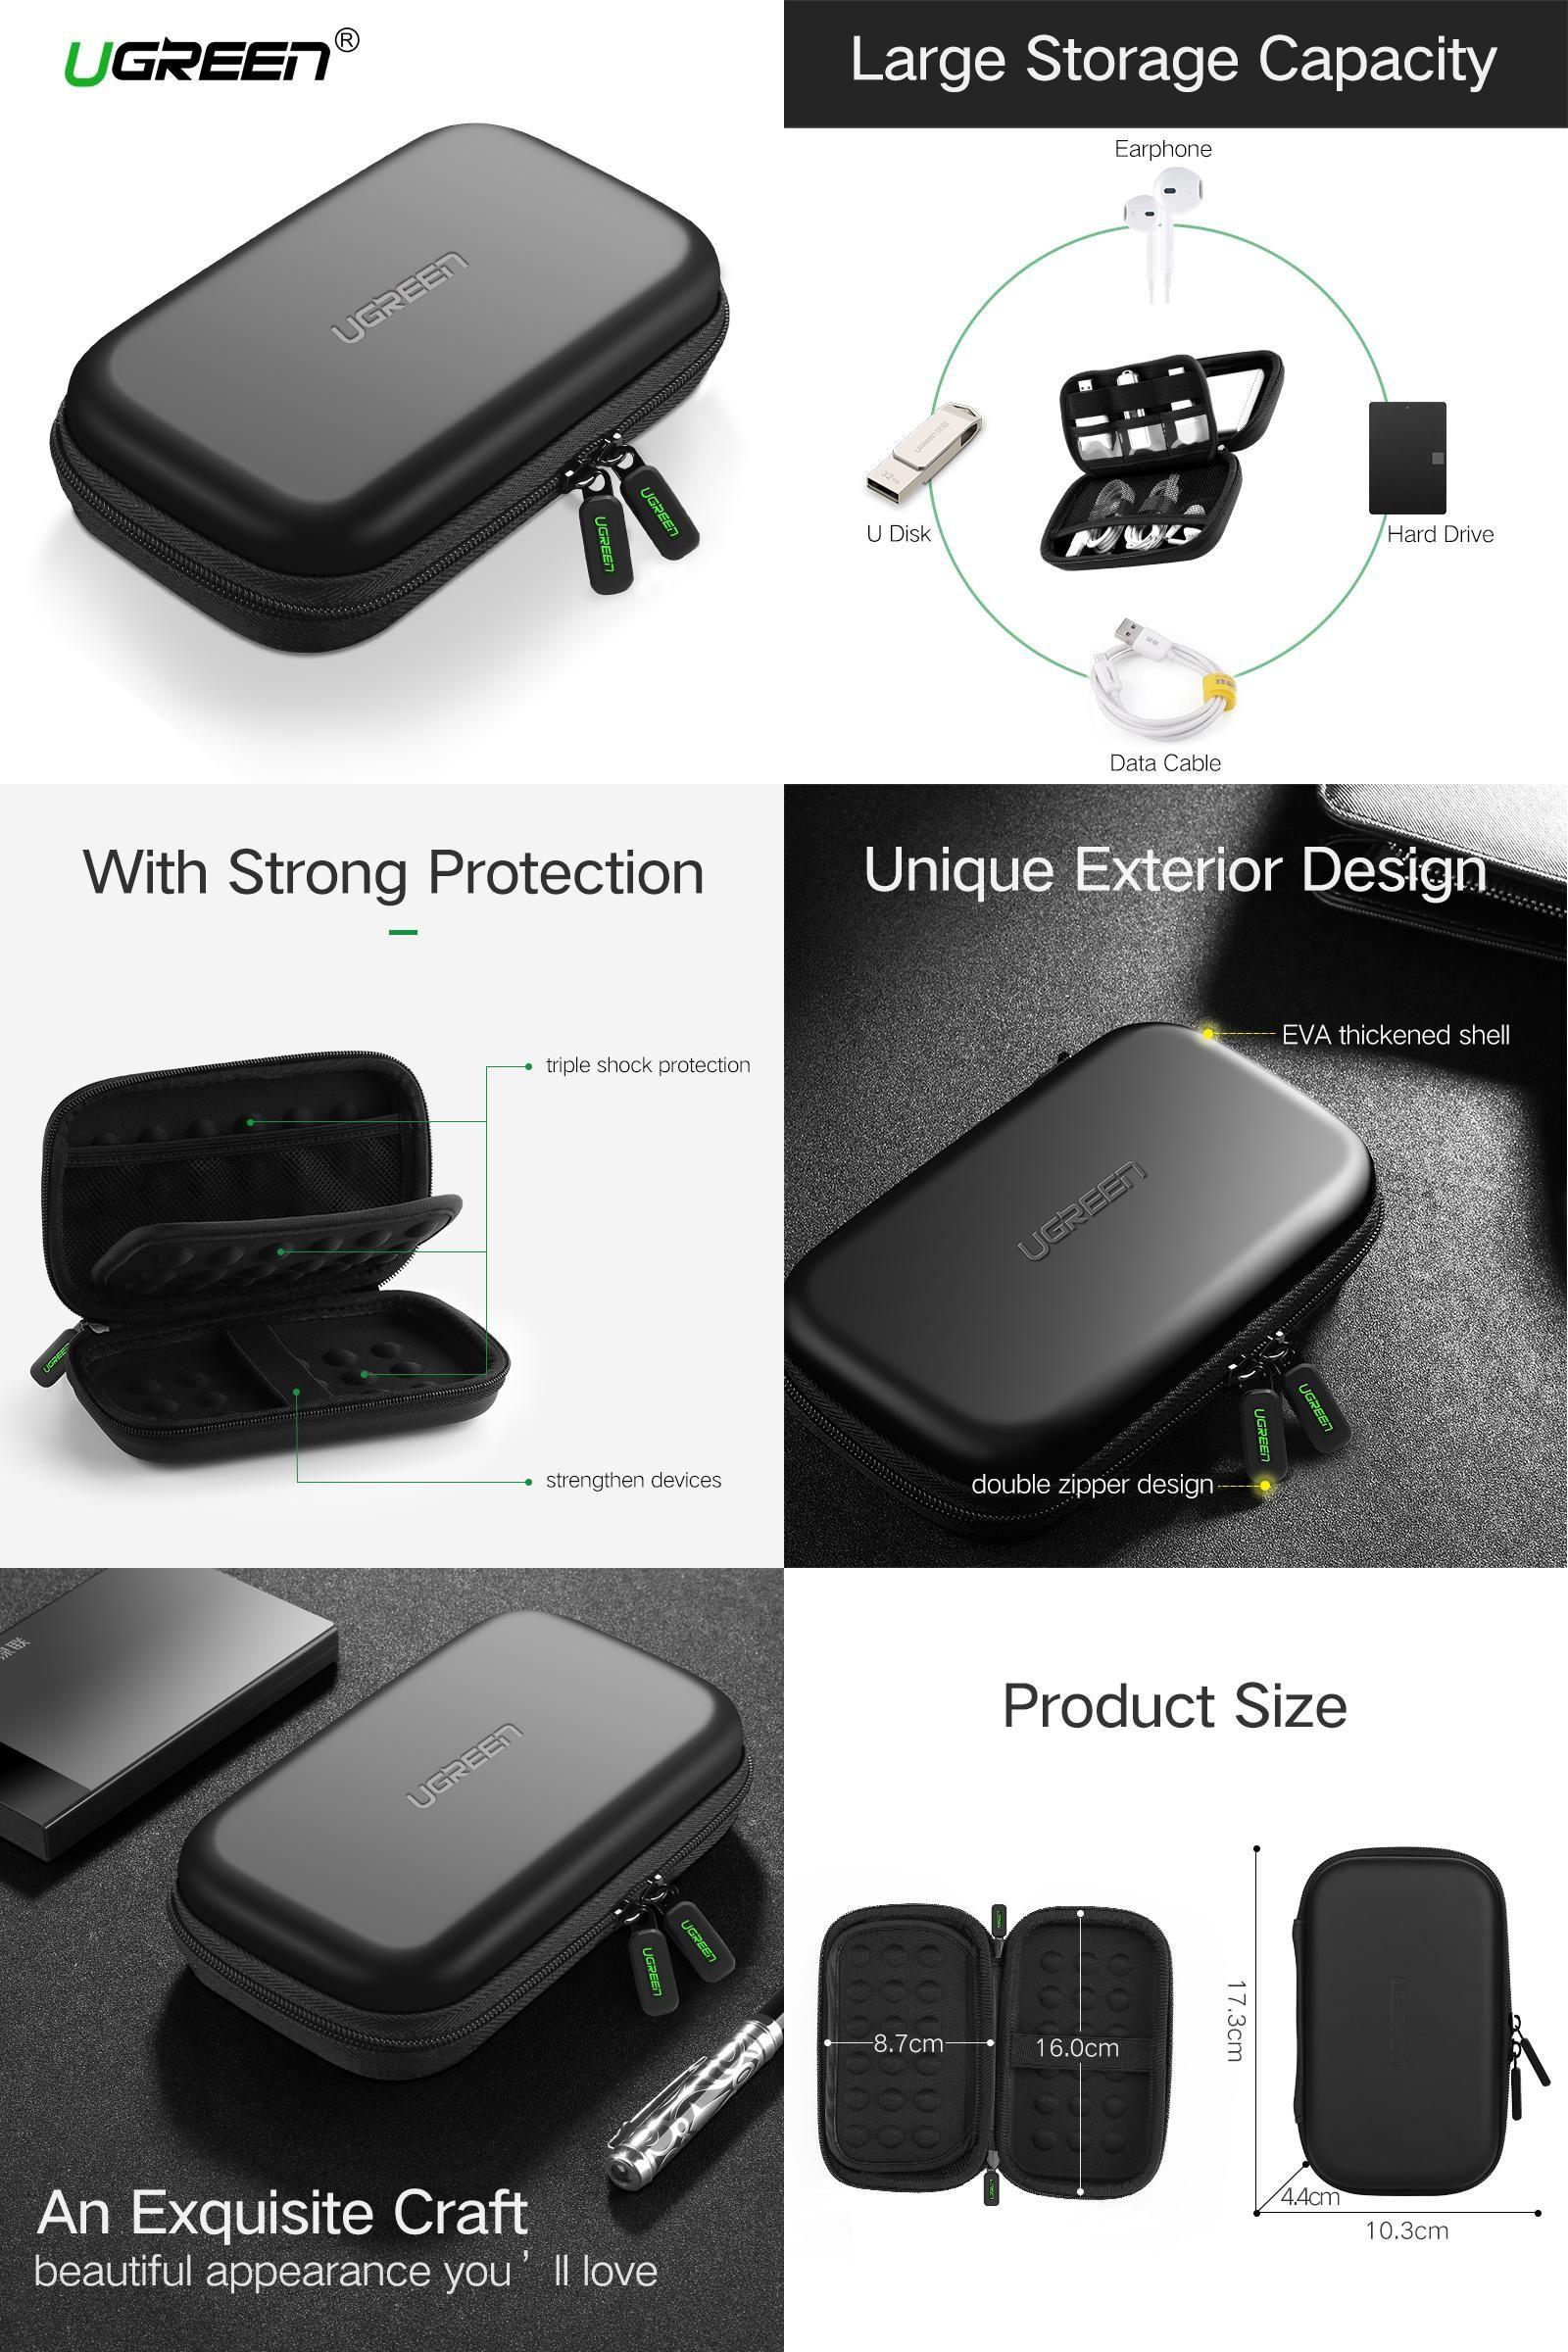 Portable Protective Bag for 2.5 inch HDD UGREEN Shockproof EVA Hard Drive Case